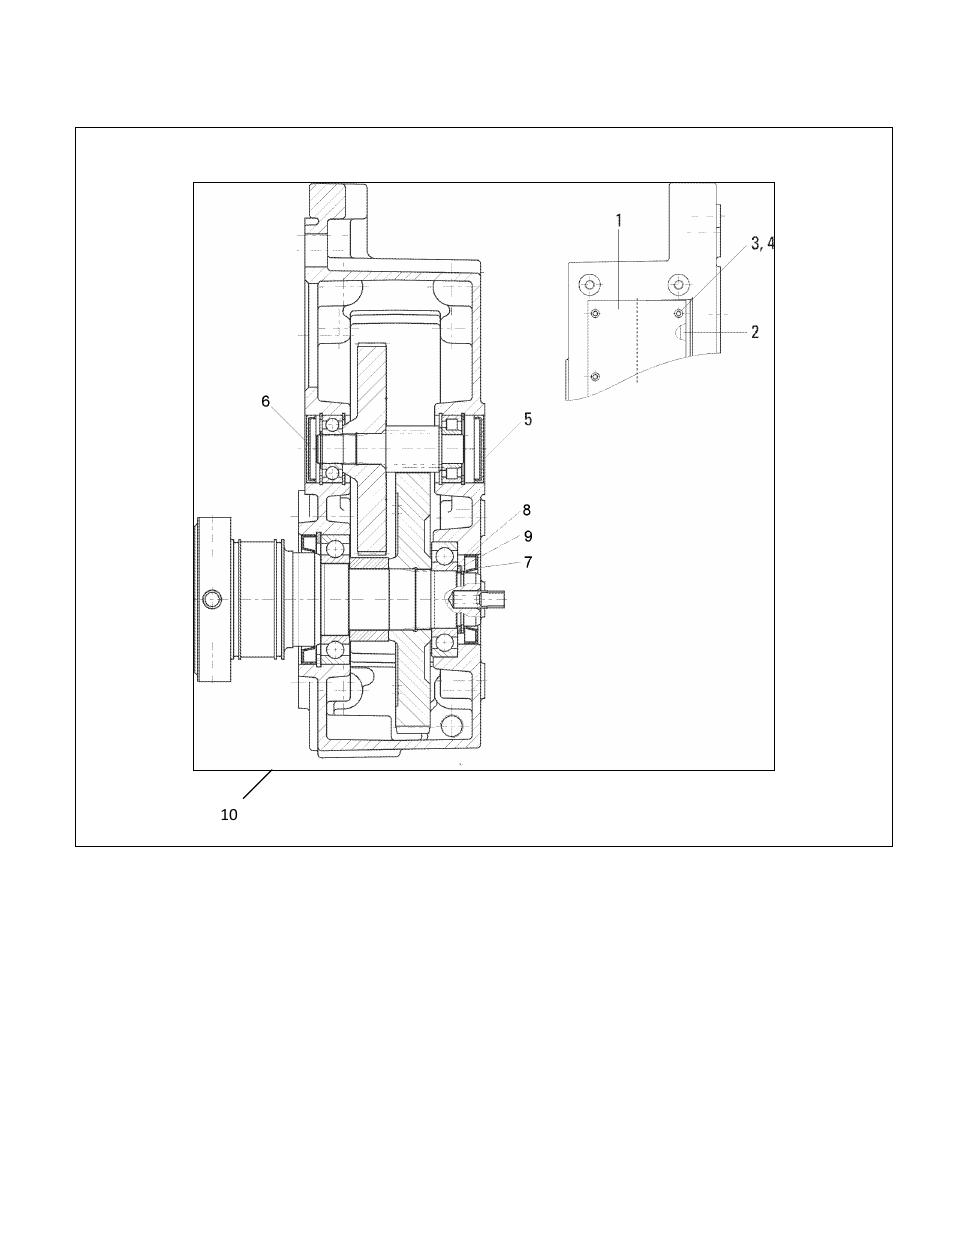 Harrington Hoist And Cranes Parts The Best Crane Of 2018 Rm Wiring Diagram Somurich